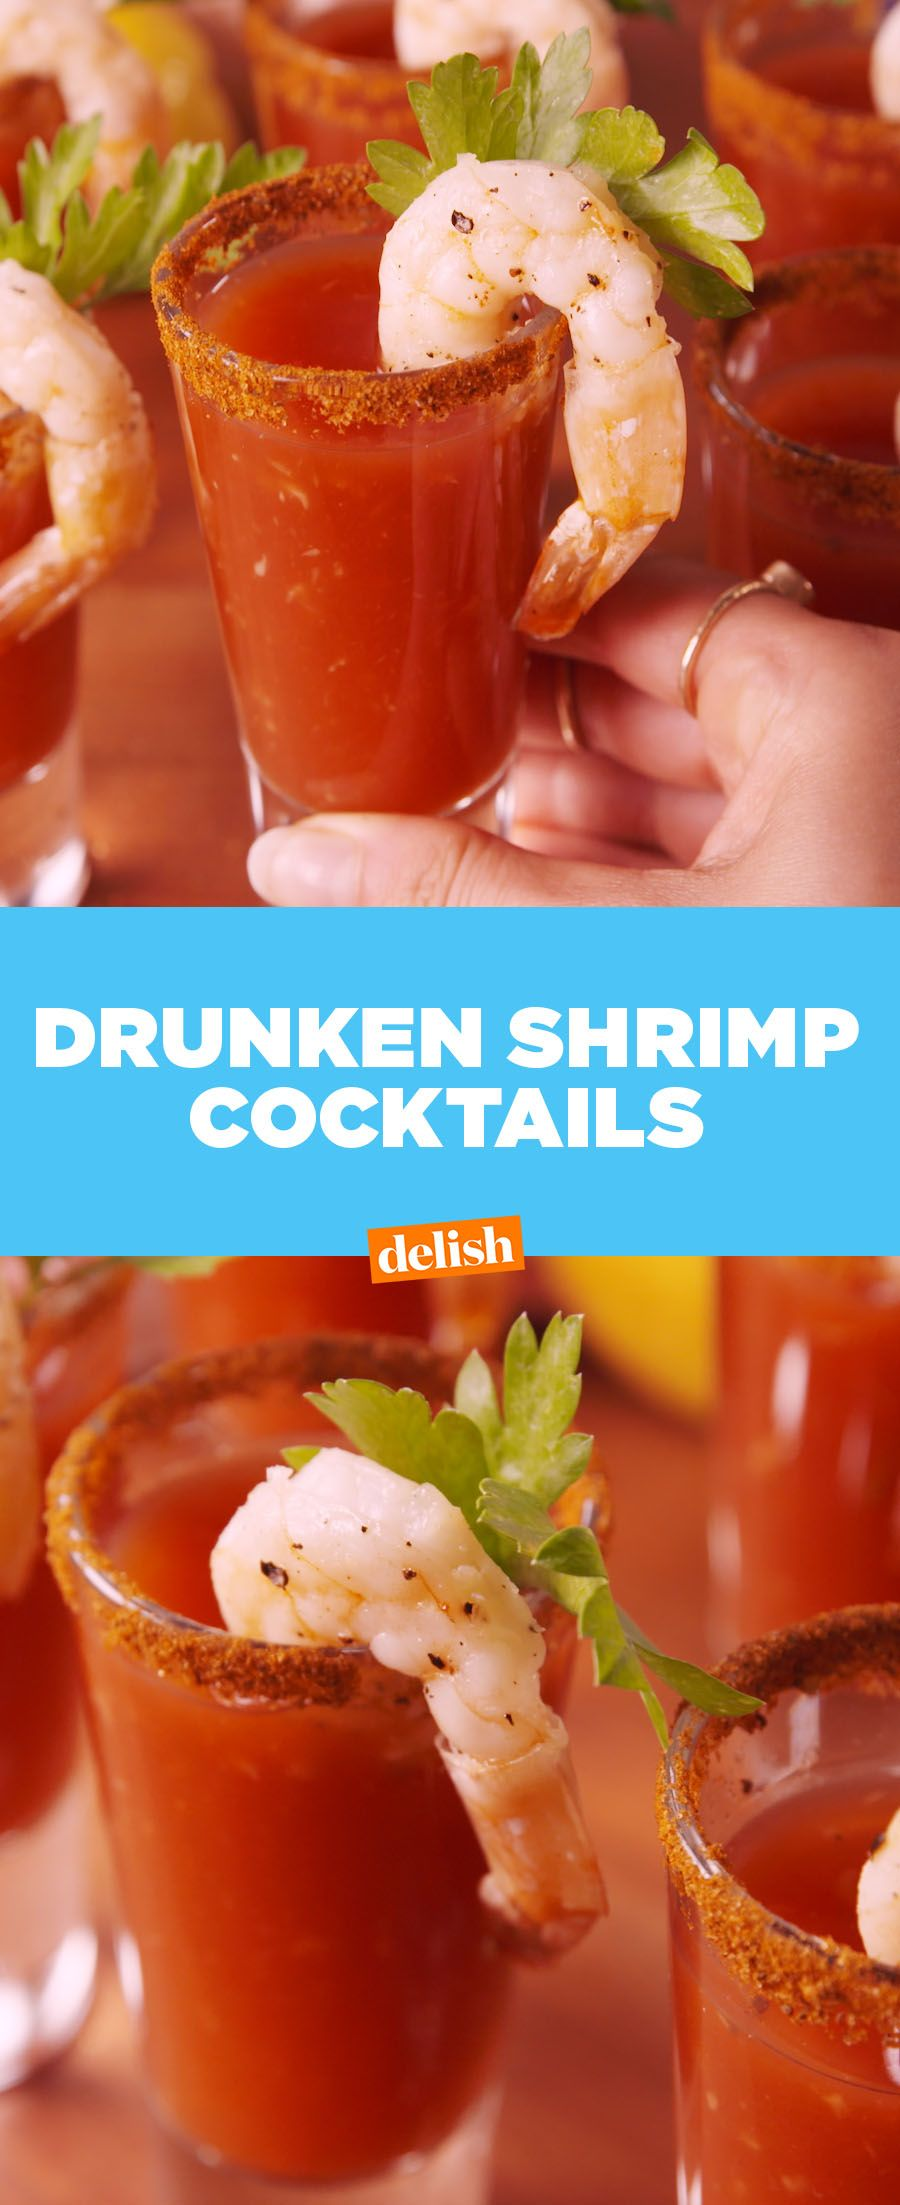 Drunken Shrimp Cocktail